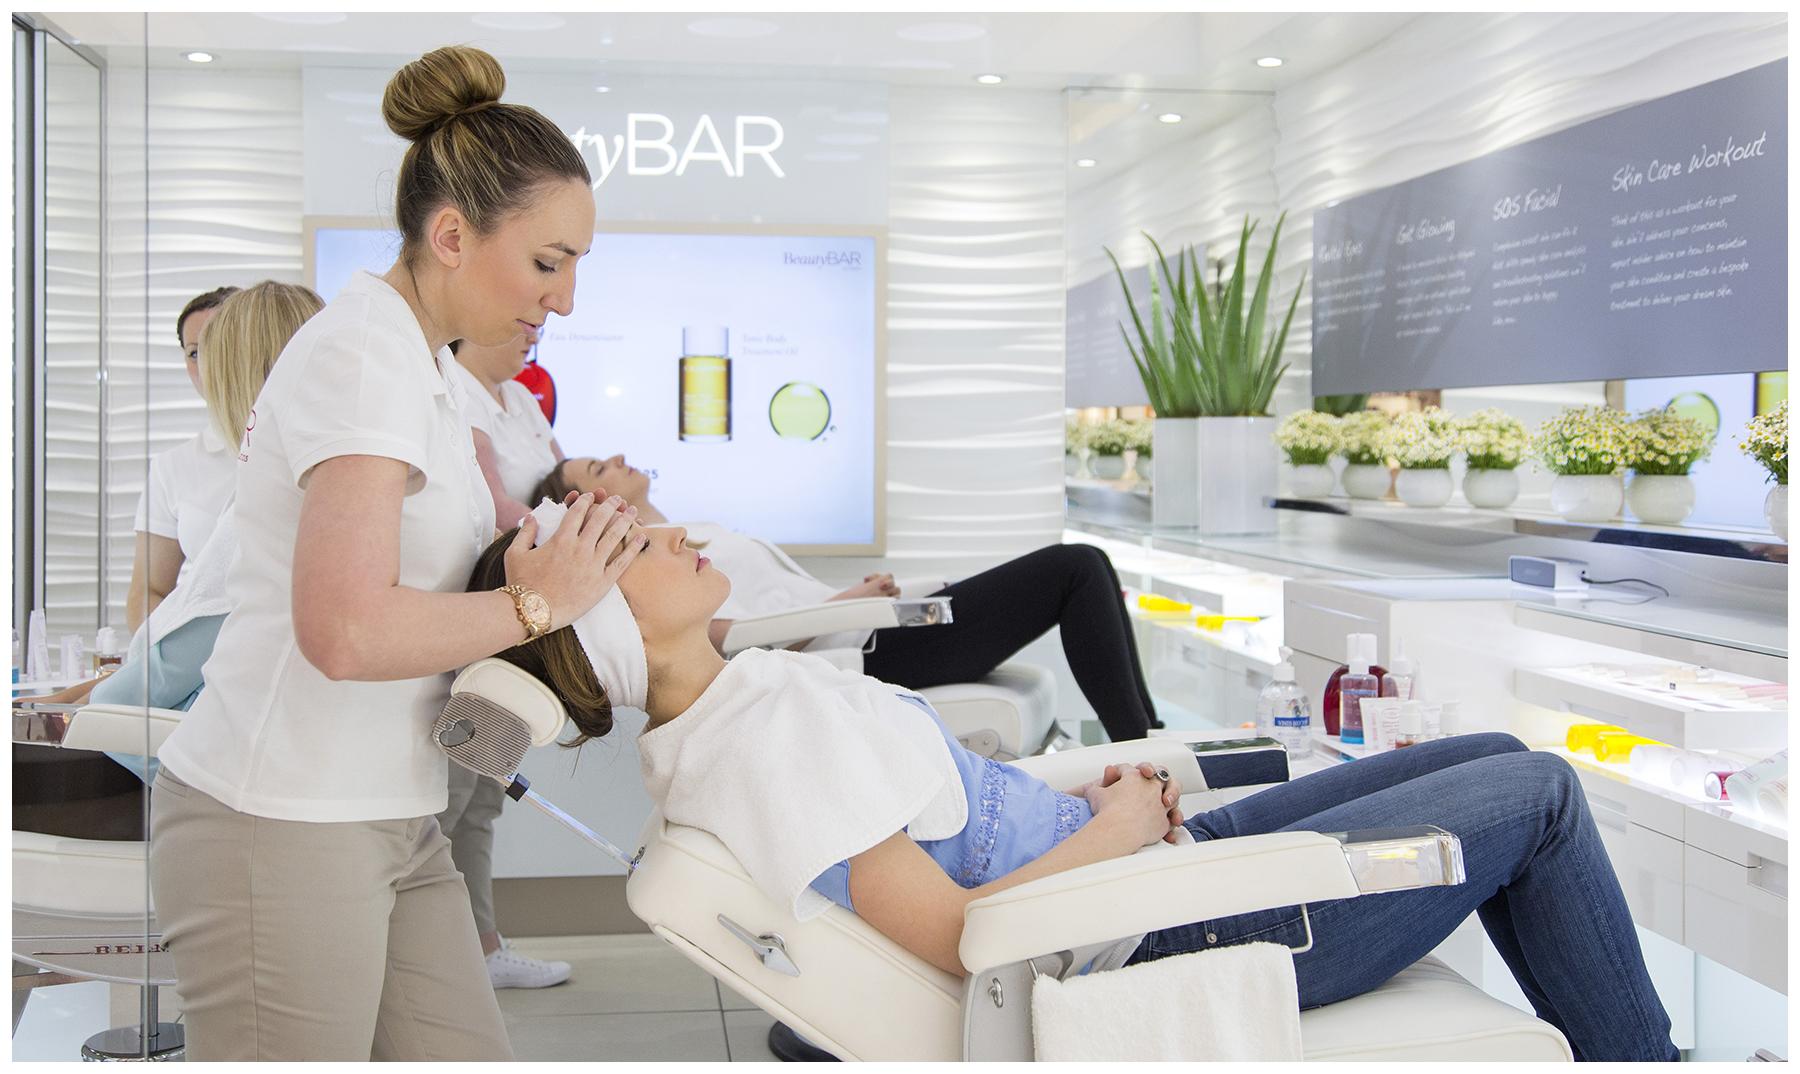 Clarins-BeautyBAR-Kar-001